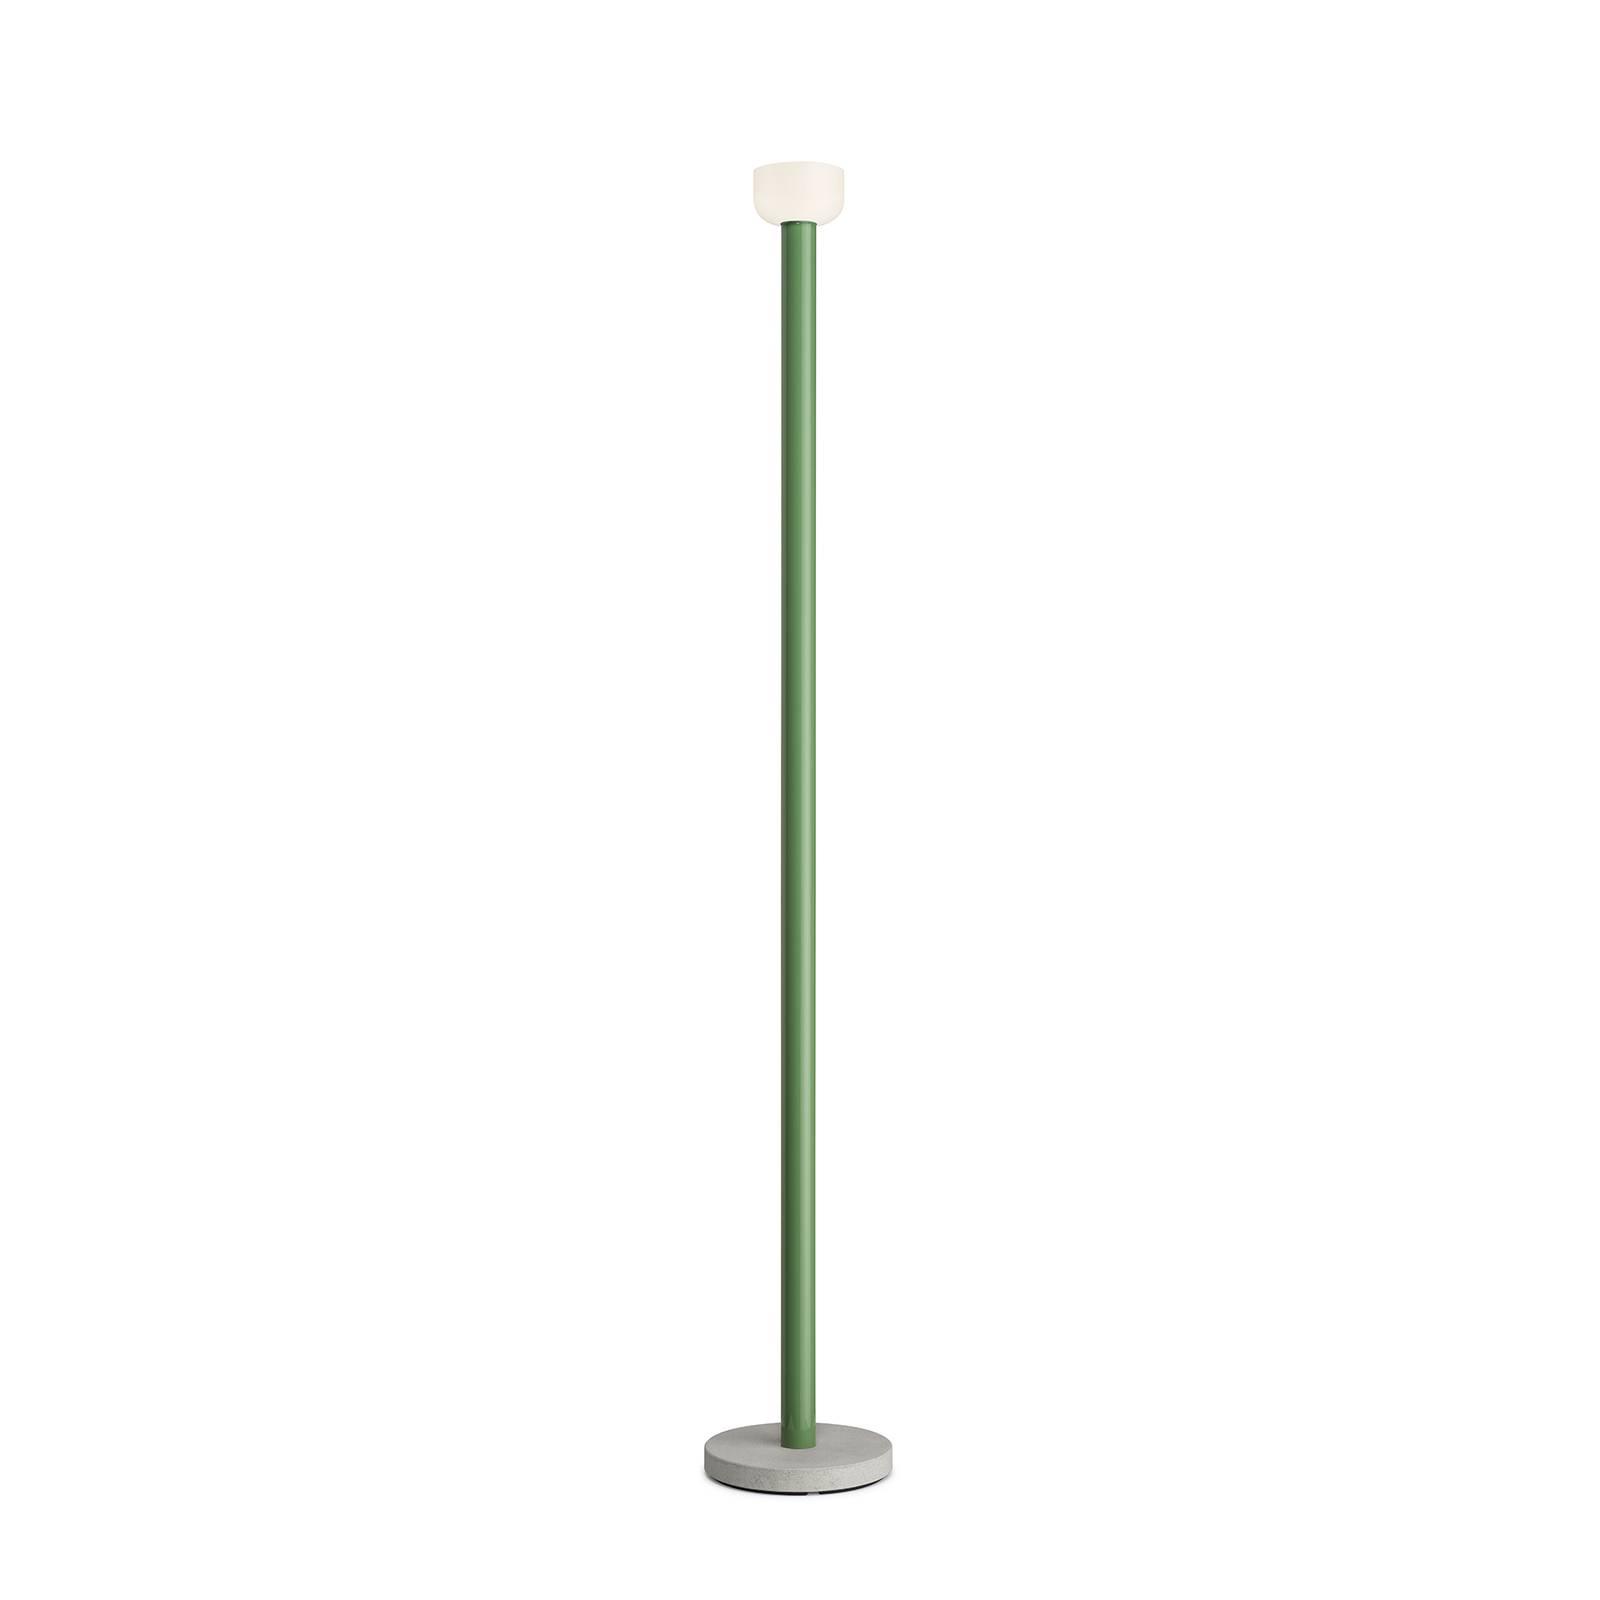 FLOS Bellhop LED-Stehleuchte, grün